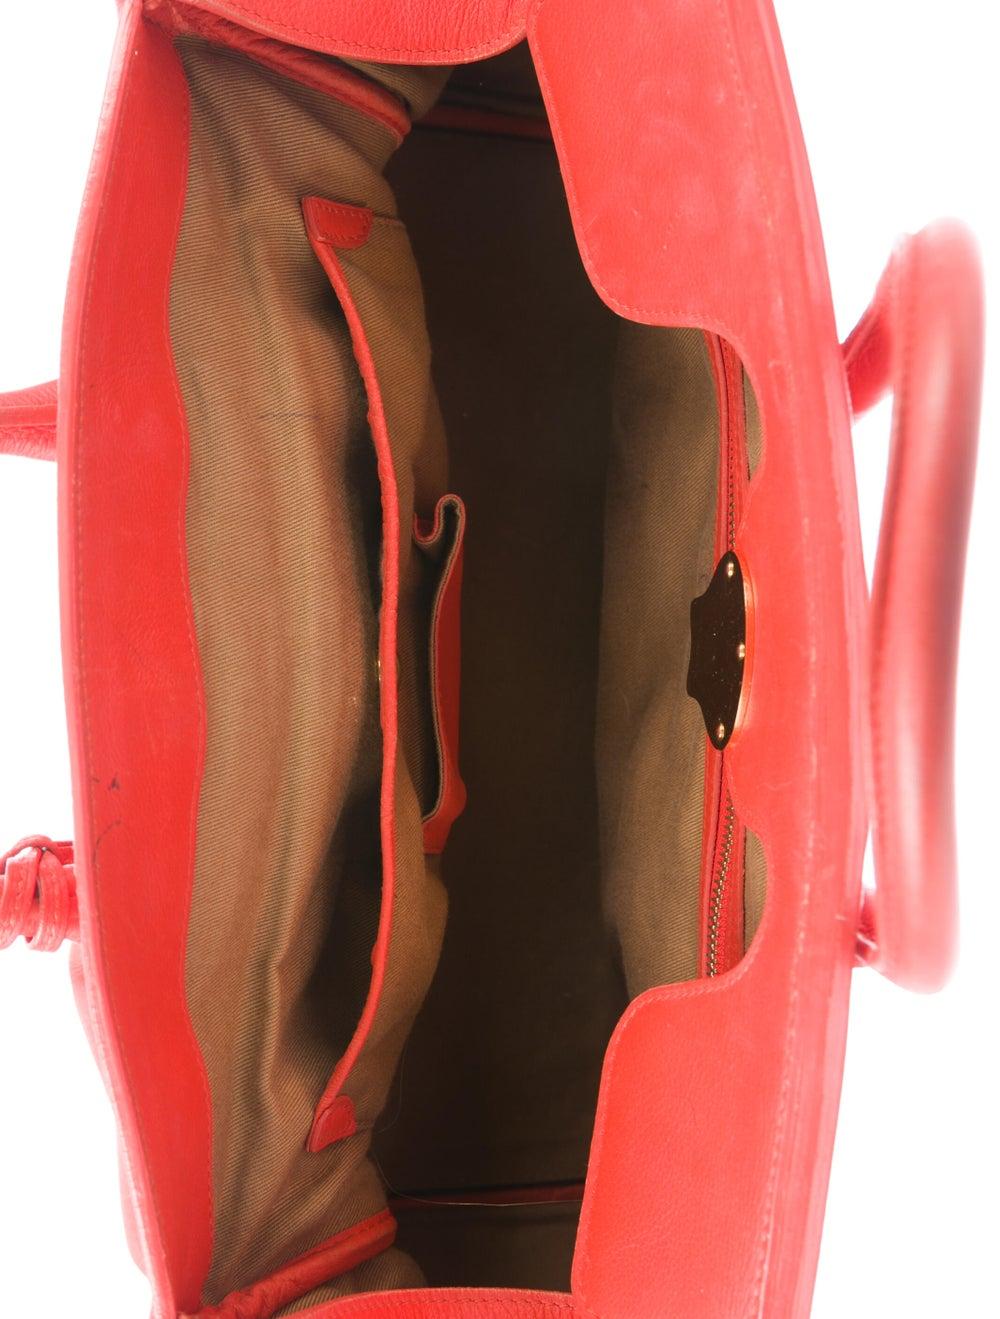 Ralph Lauren Puffy Ricky Bag gold - image 5